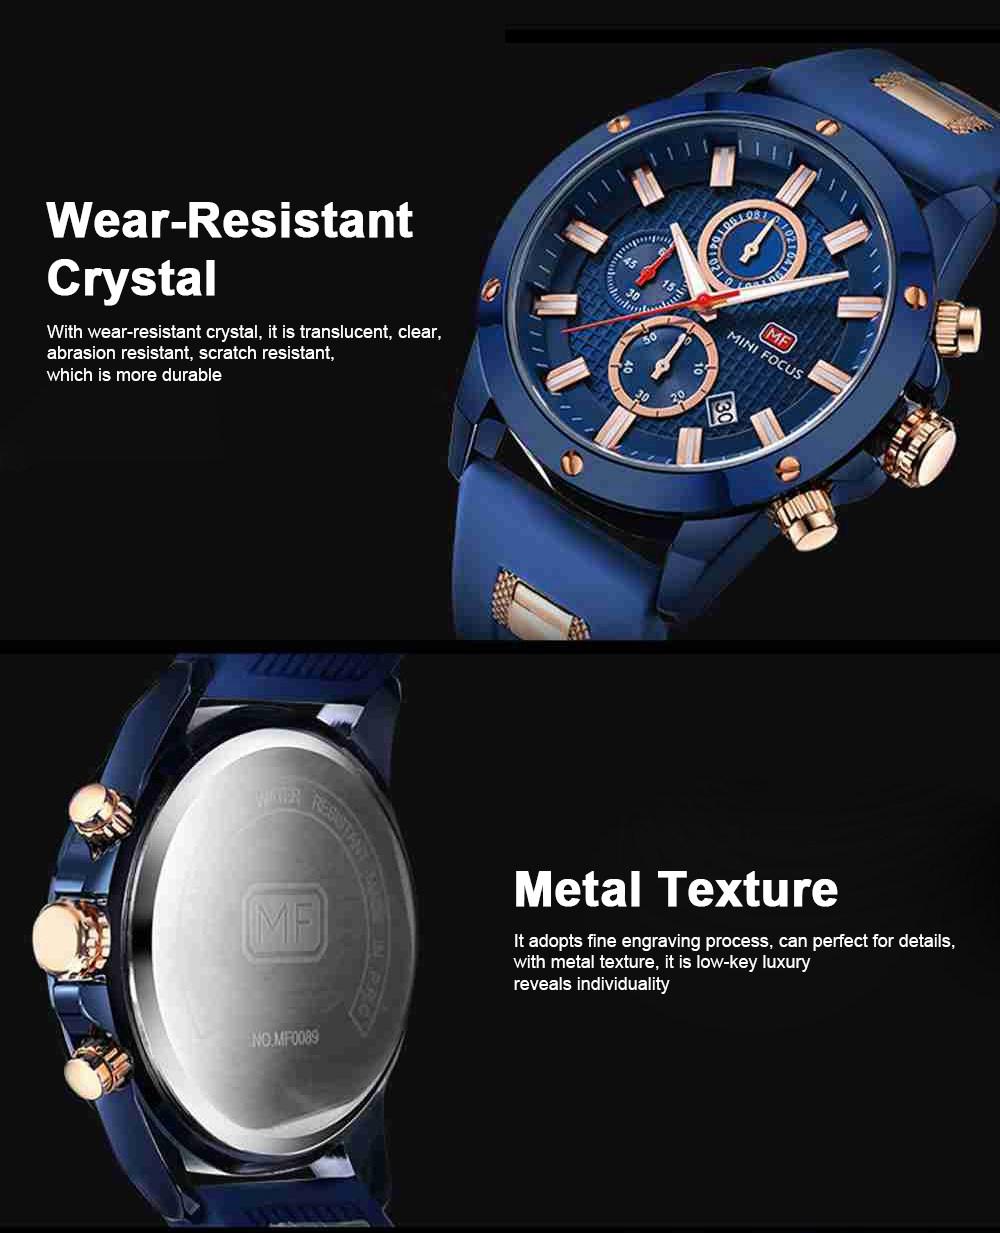 MINI FOCUS Fashion Male Quartz Watch Men Chronograph 3 Sub-dials 6 Hands Calendar Silicone Strap Waterproof 30 Meters Sport WristWatch 3